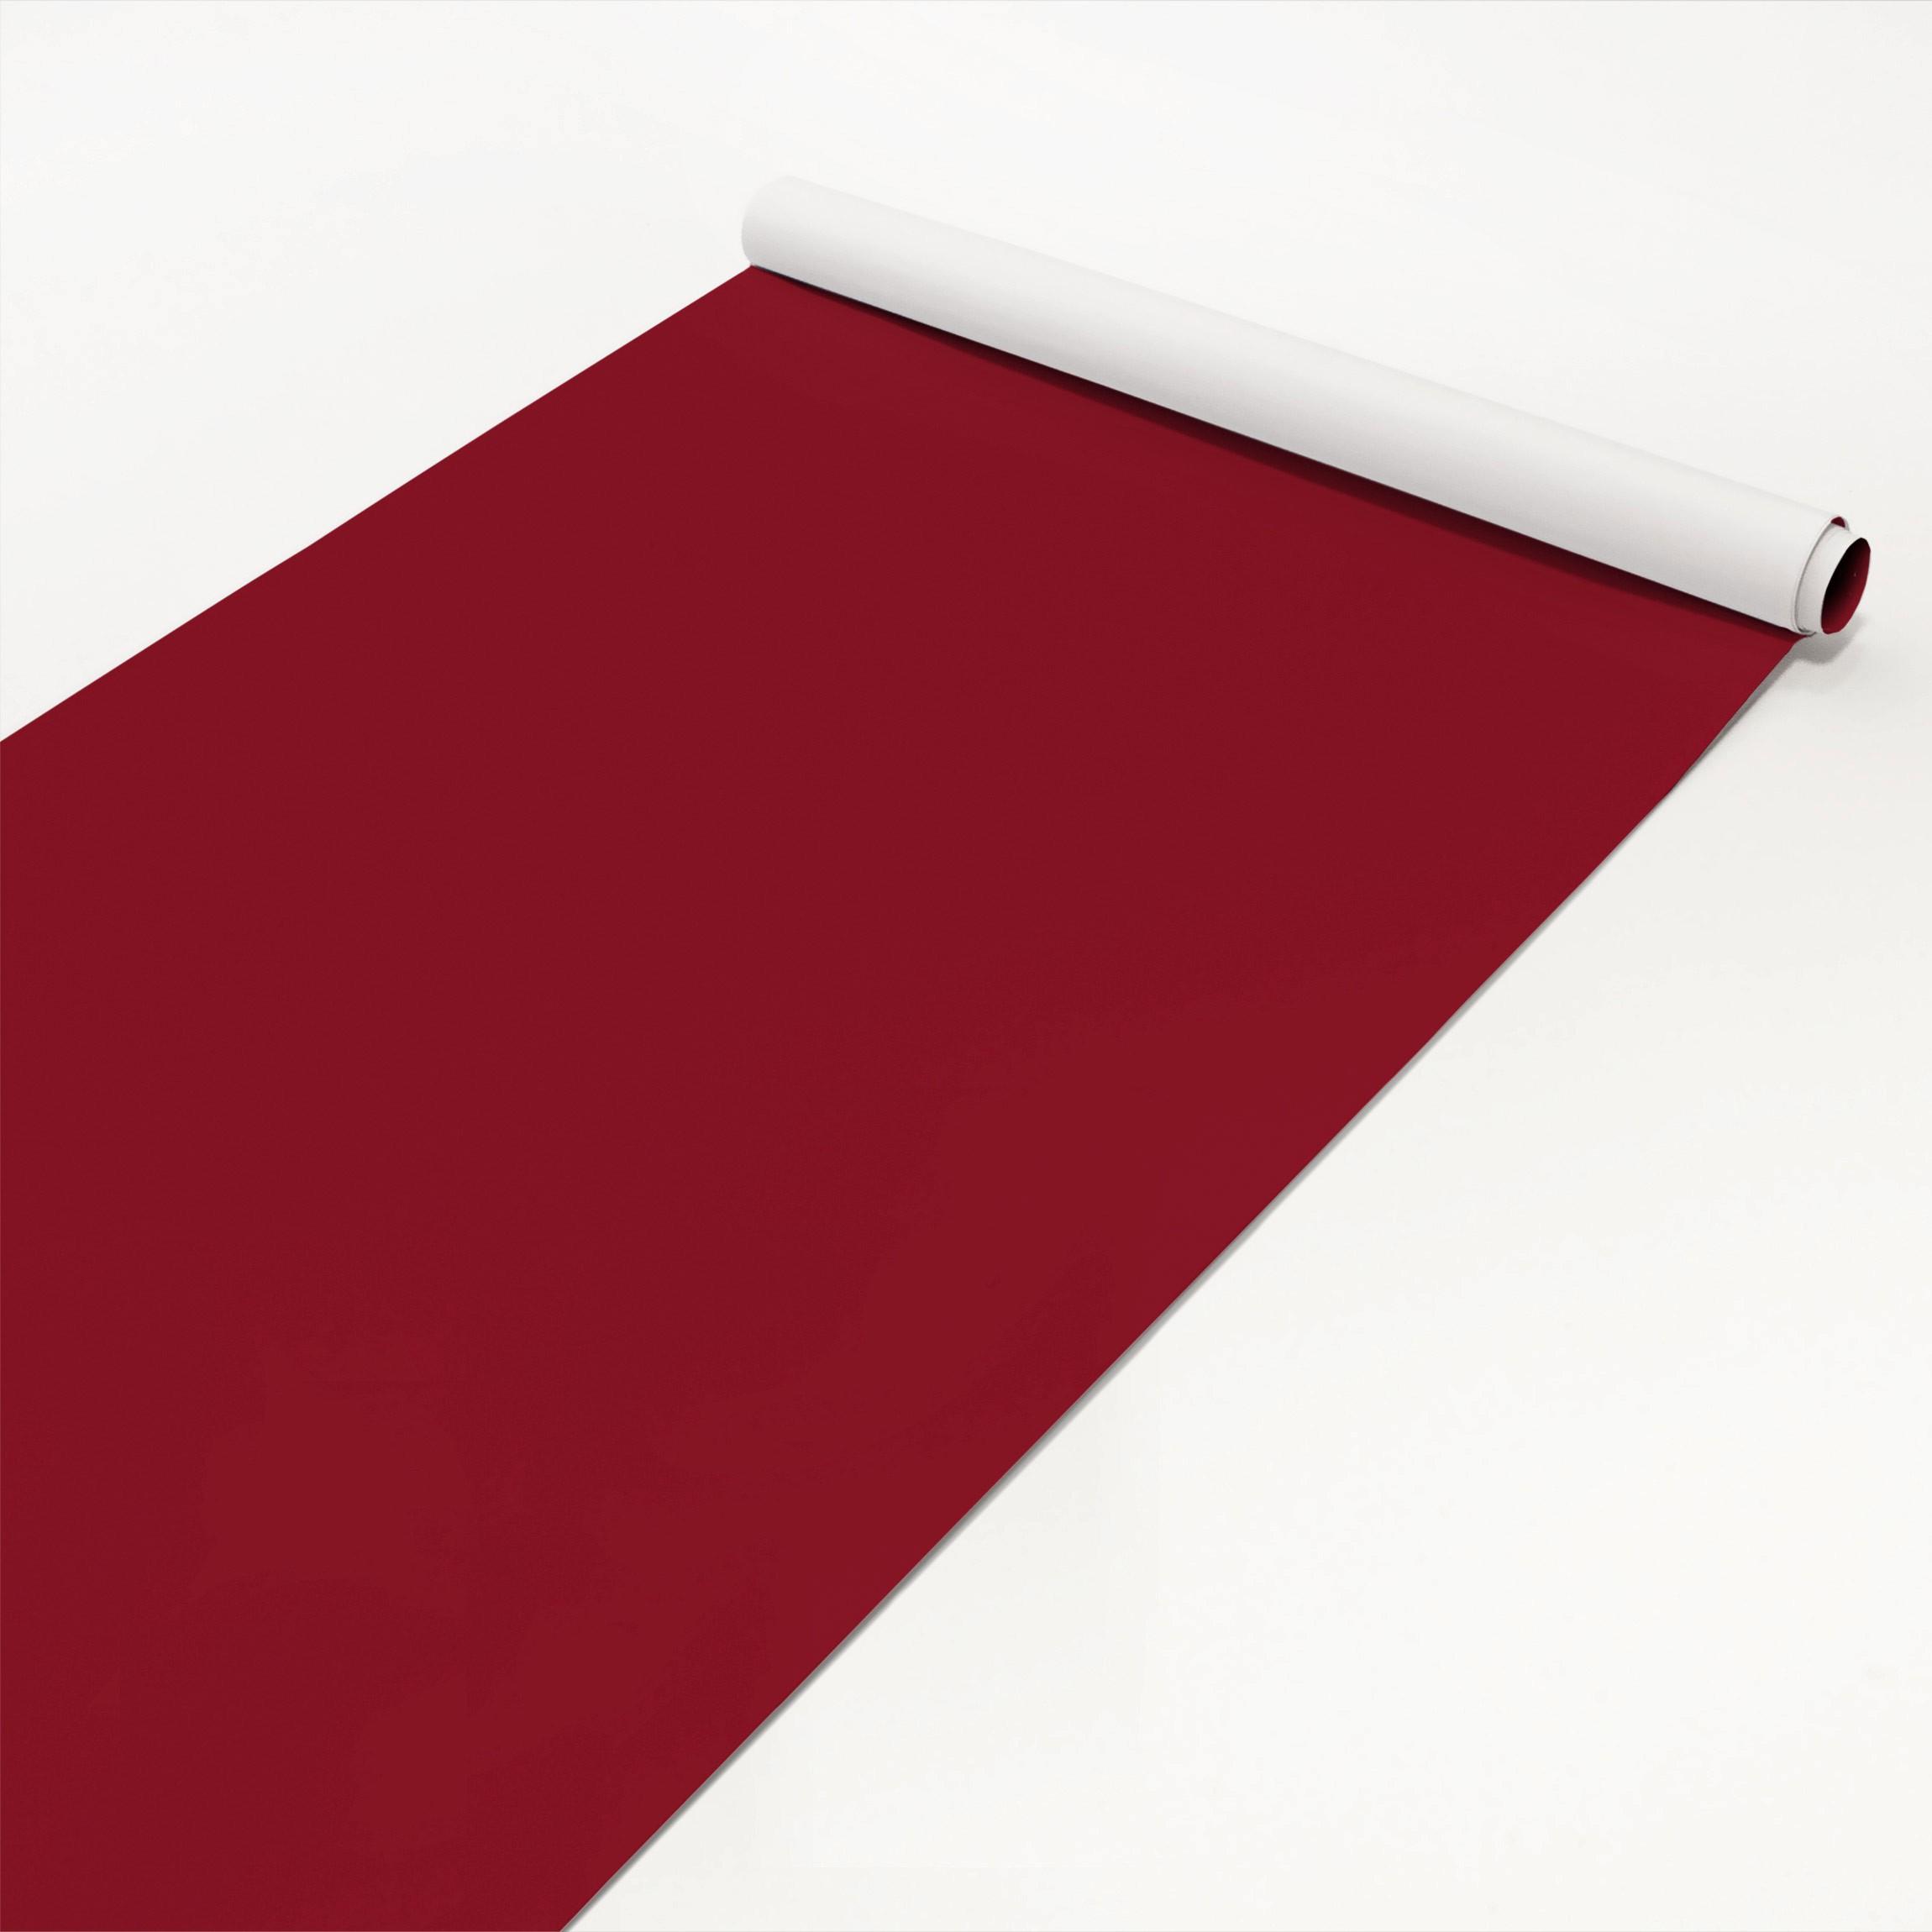 Klebefolie rot einfarbig amarena rote folie selbstklebend for Klebefolie rot hochglanz